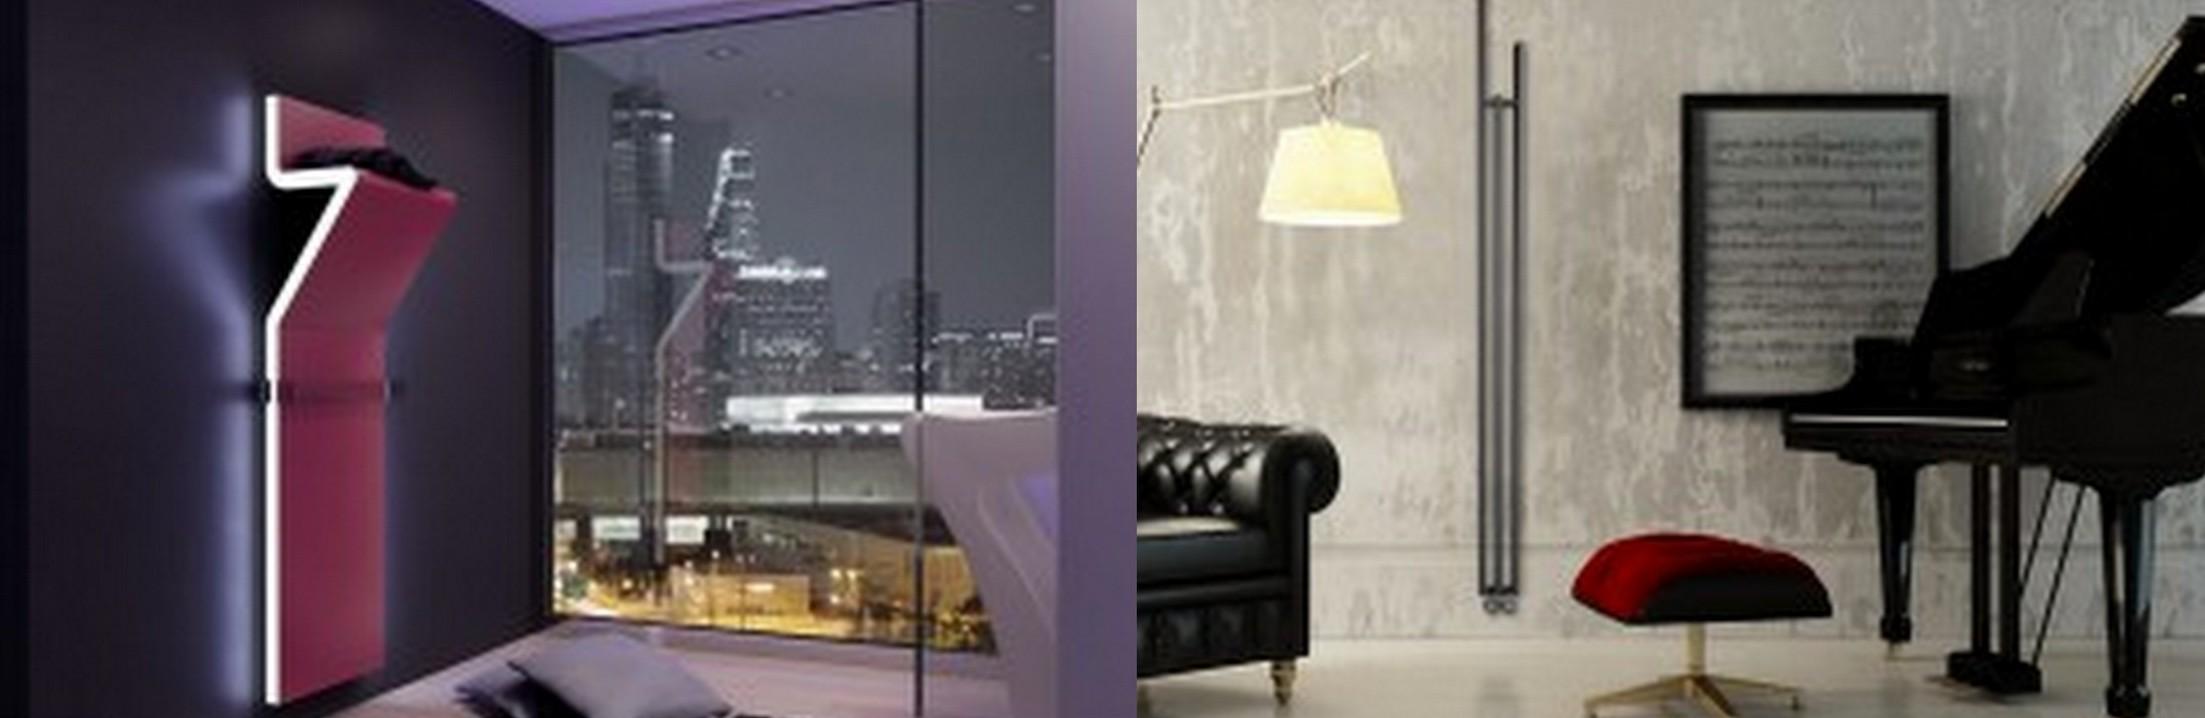 Radiateur Art Deco Cyber Confort